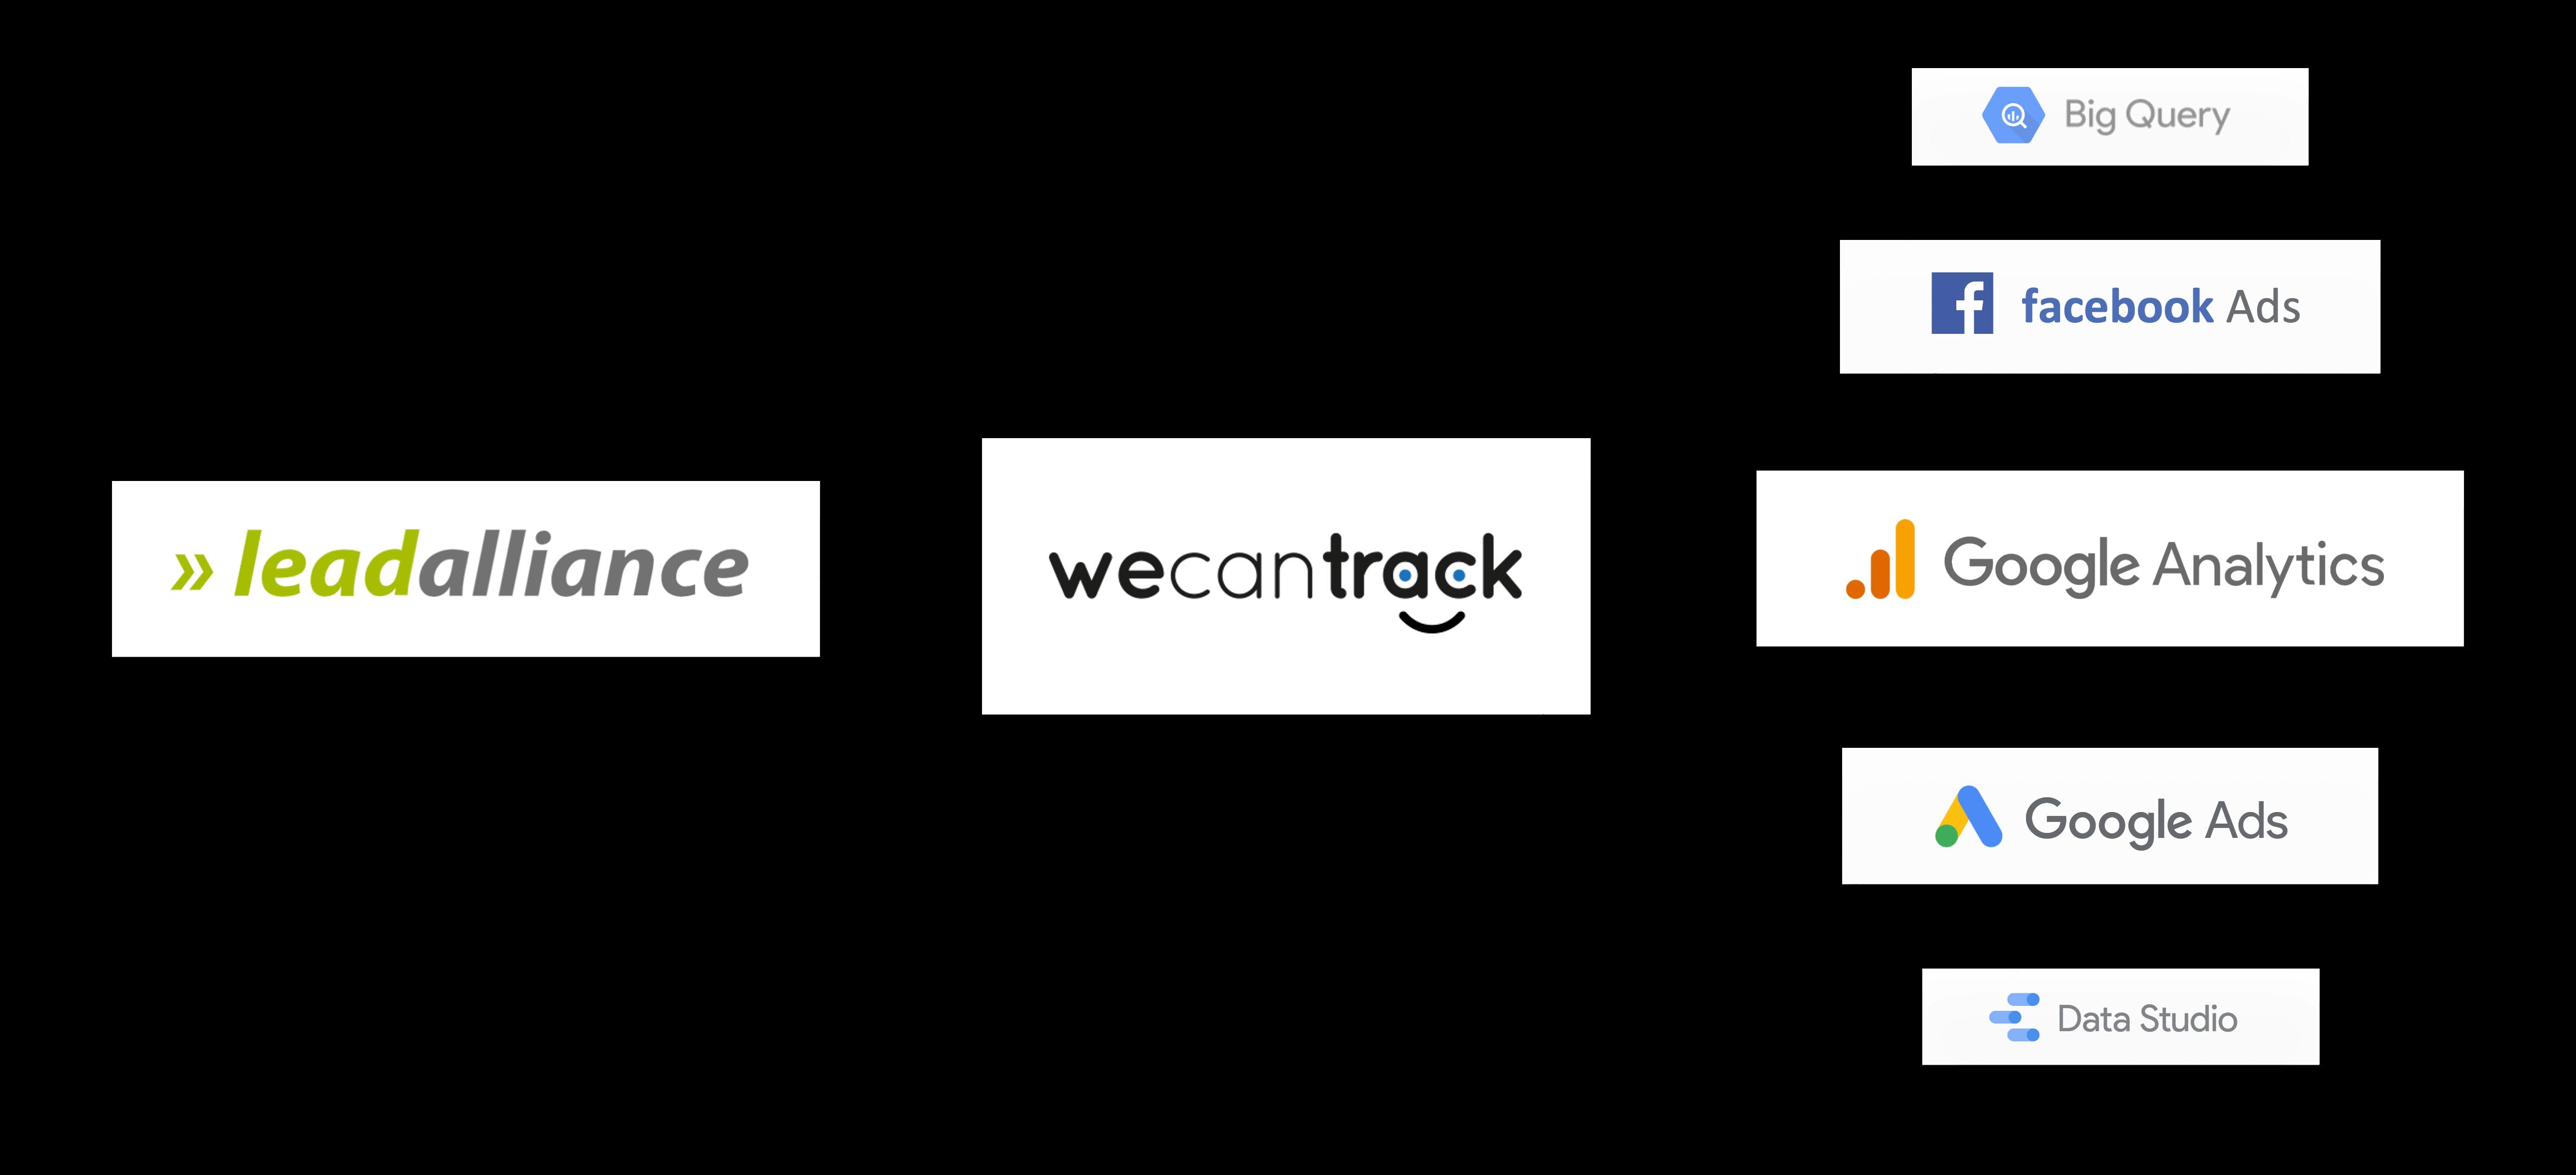 integrate-leadalliance-affiliate-conversions-via-api-1